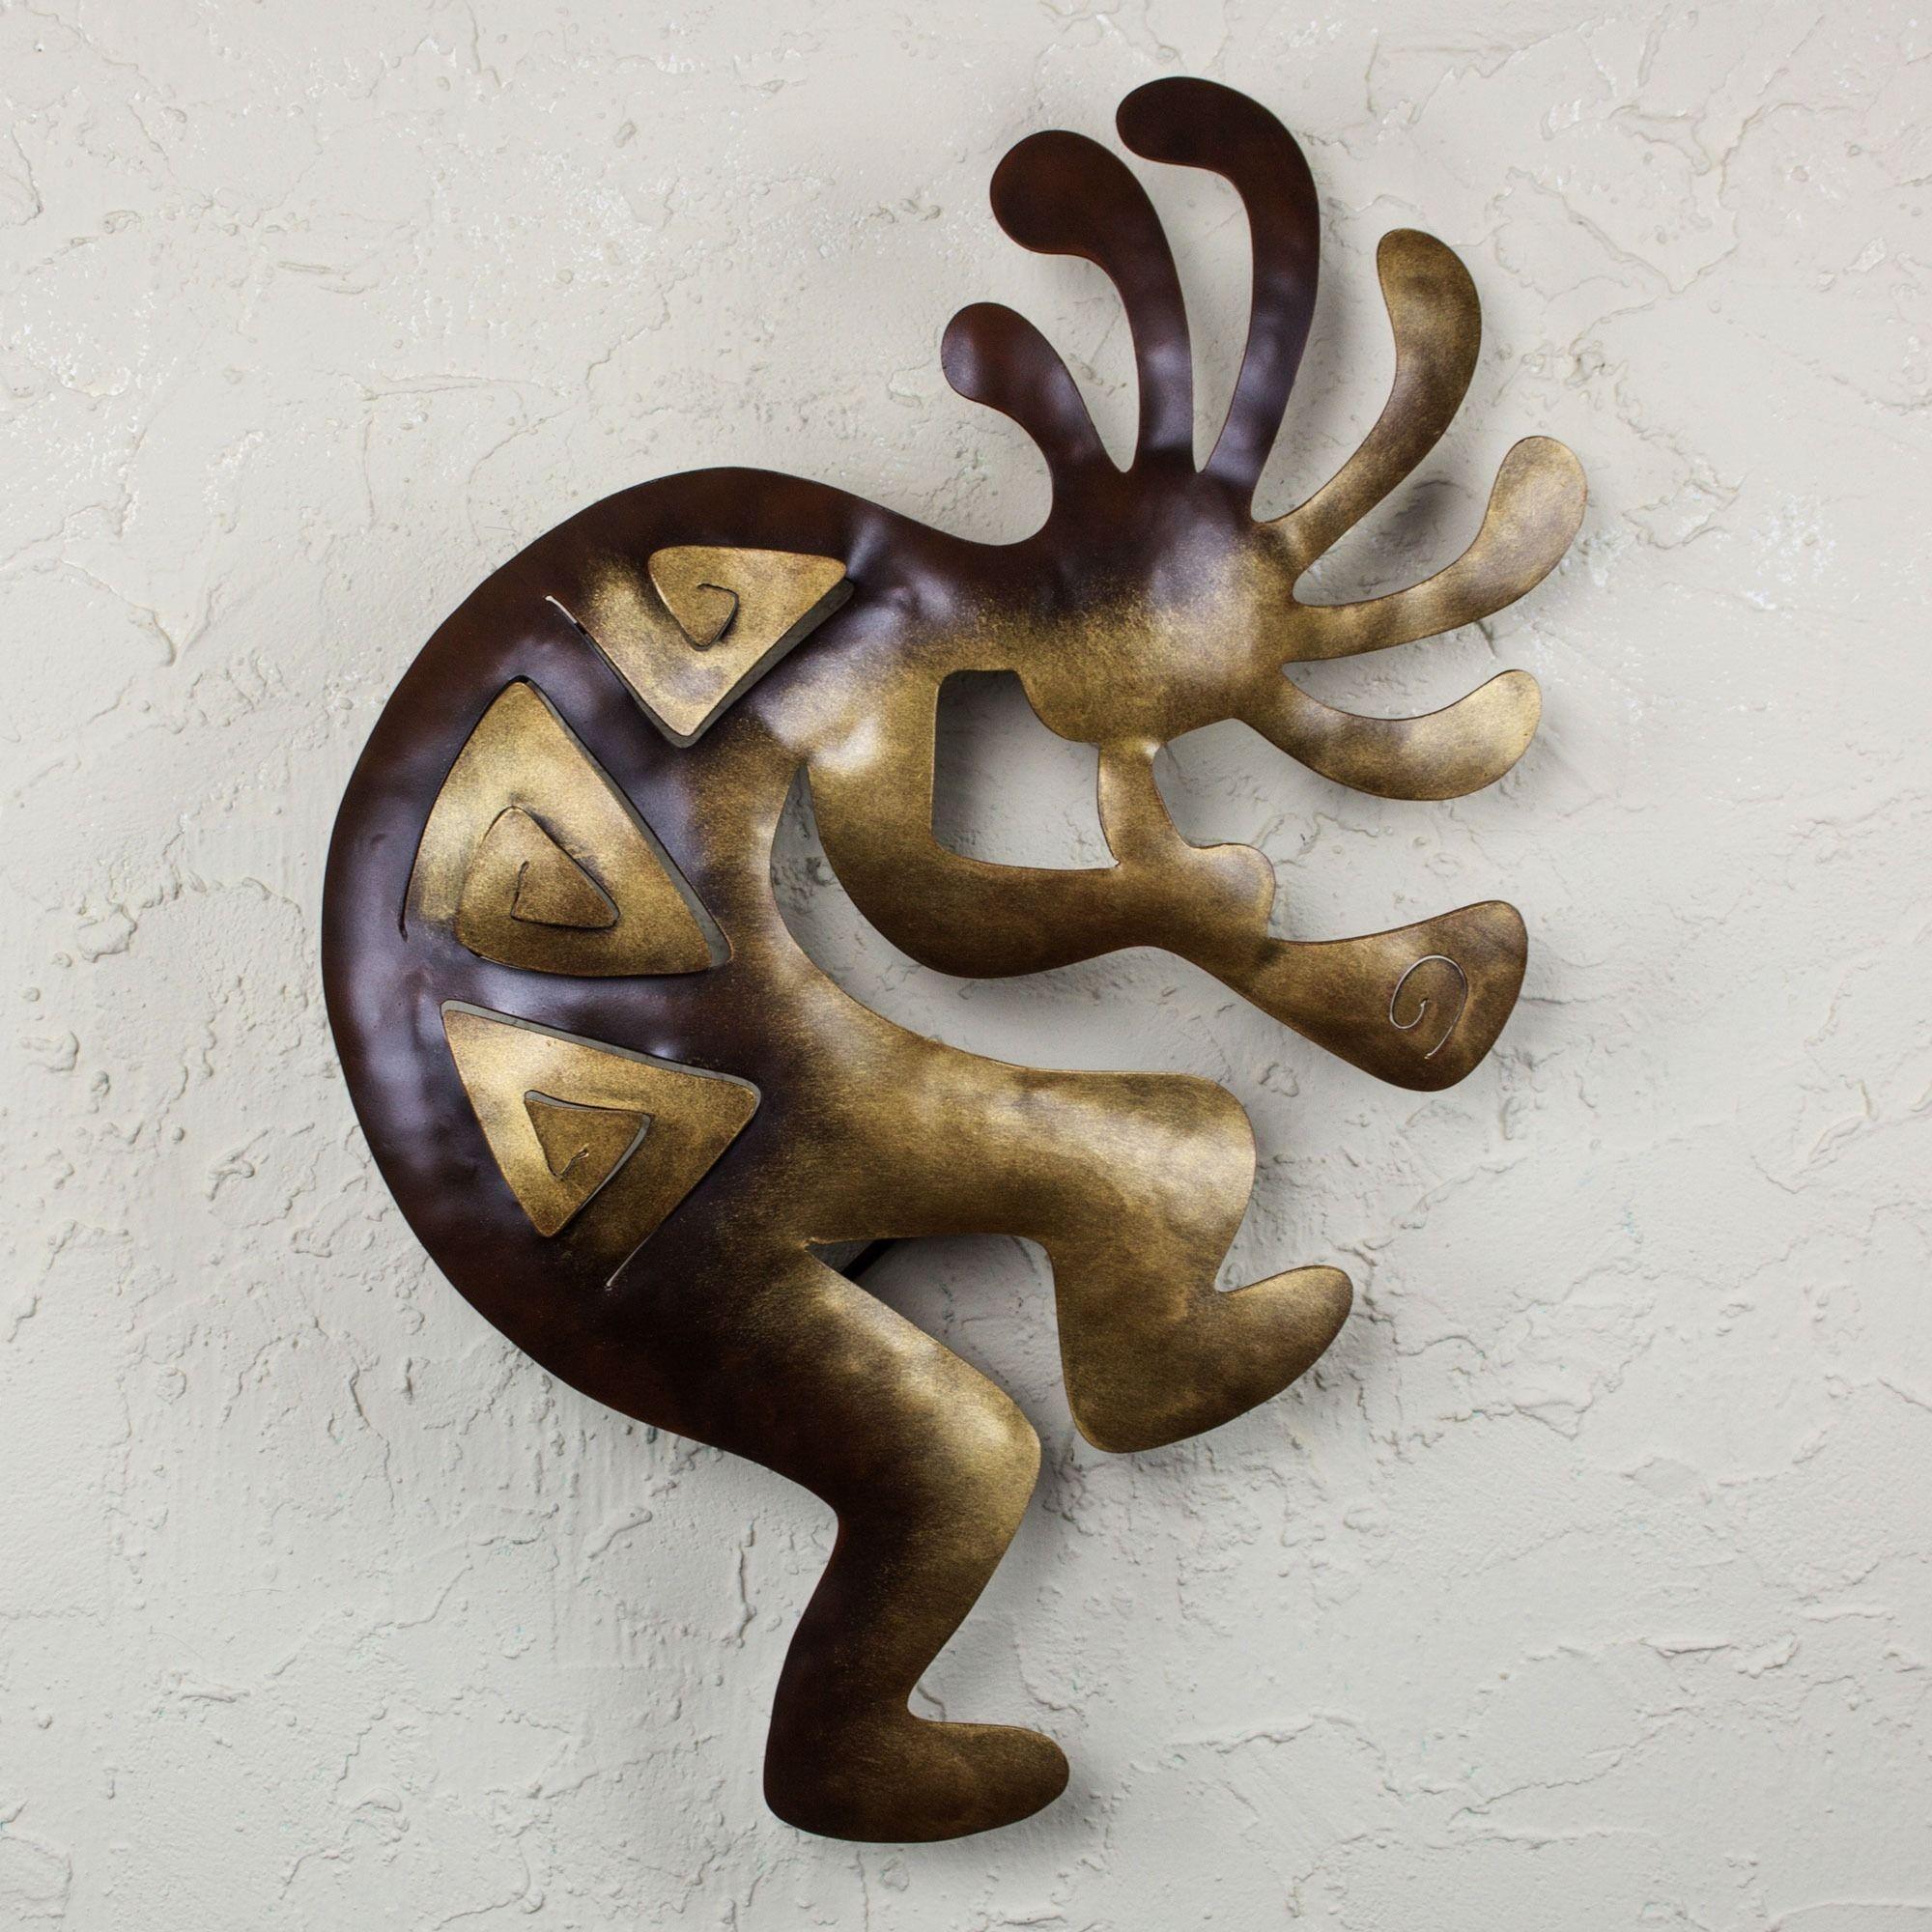 Rustic Metal Wall Art Sculptures Adorable Novica Kokopelli Peace Indoor Outdoor Decorator Accent Brown And Inspiration